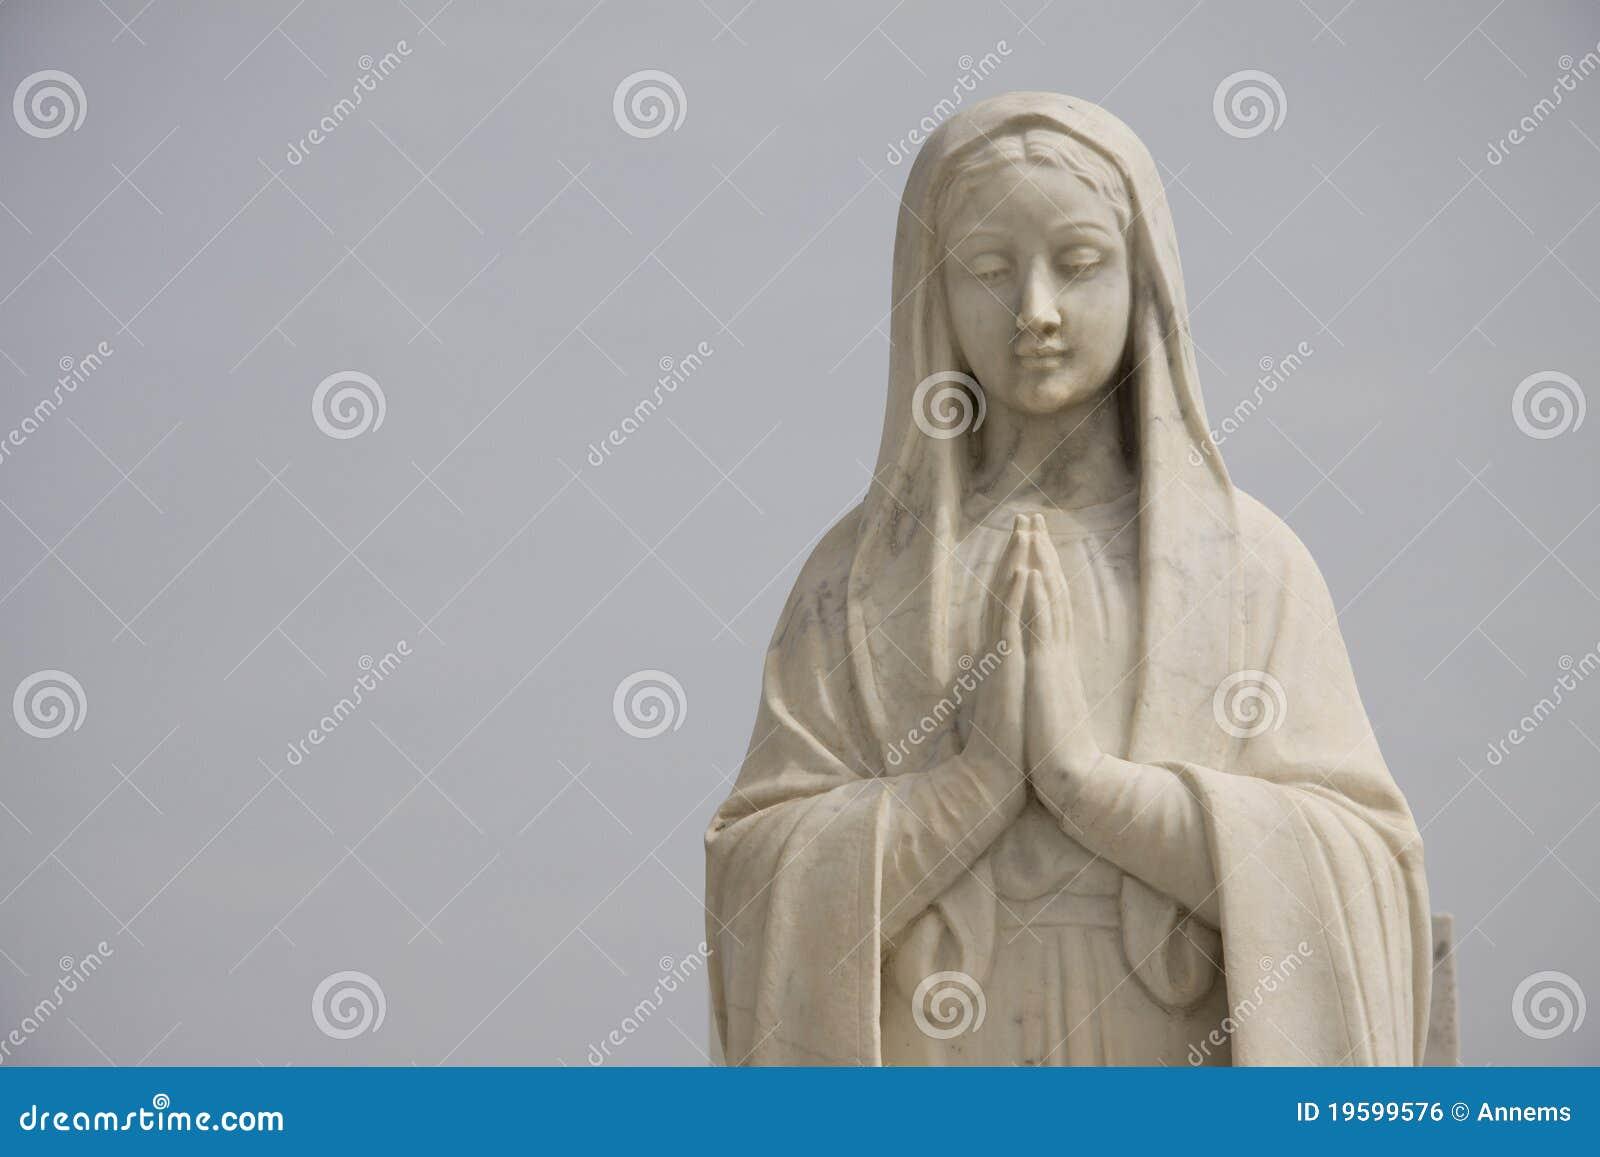 Statue Of Praying Holy Mary Royalty Free Stock Image - Image: 19599576